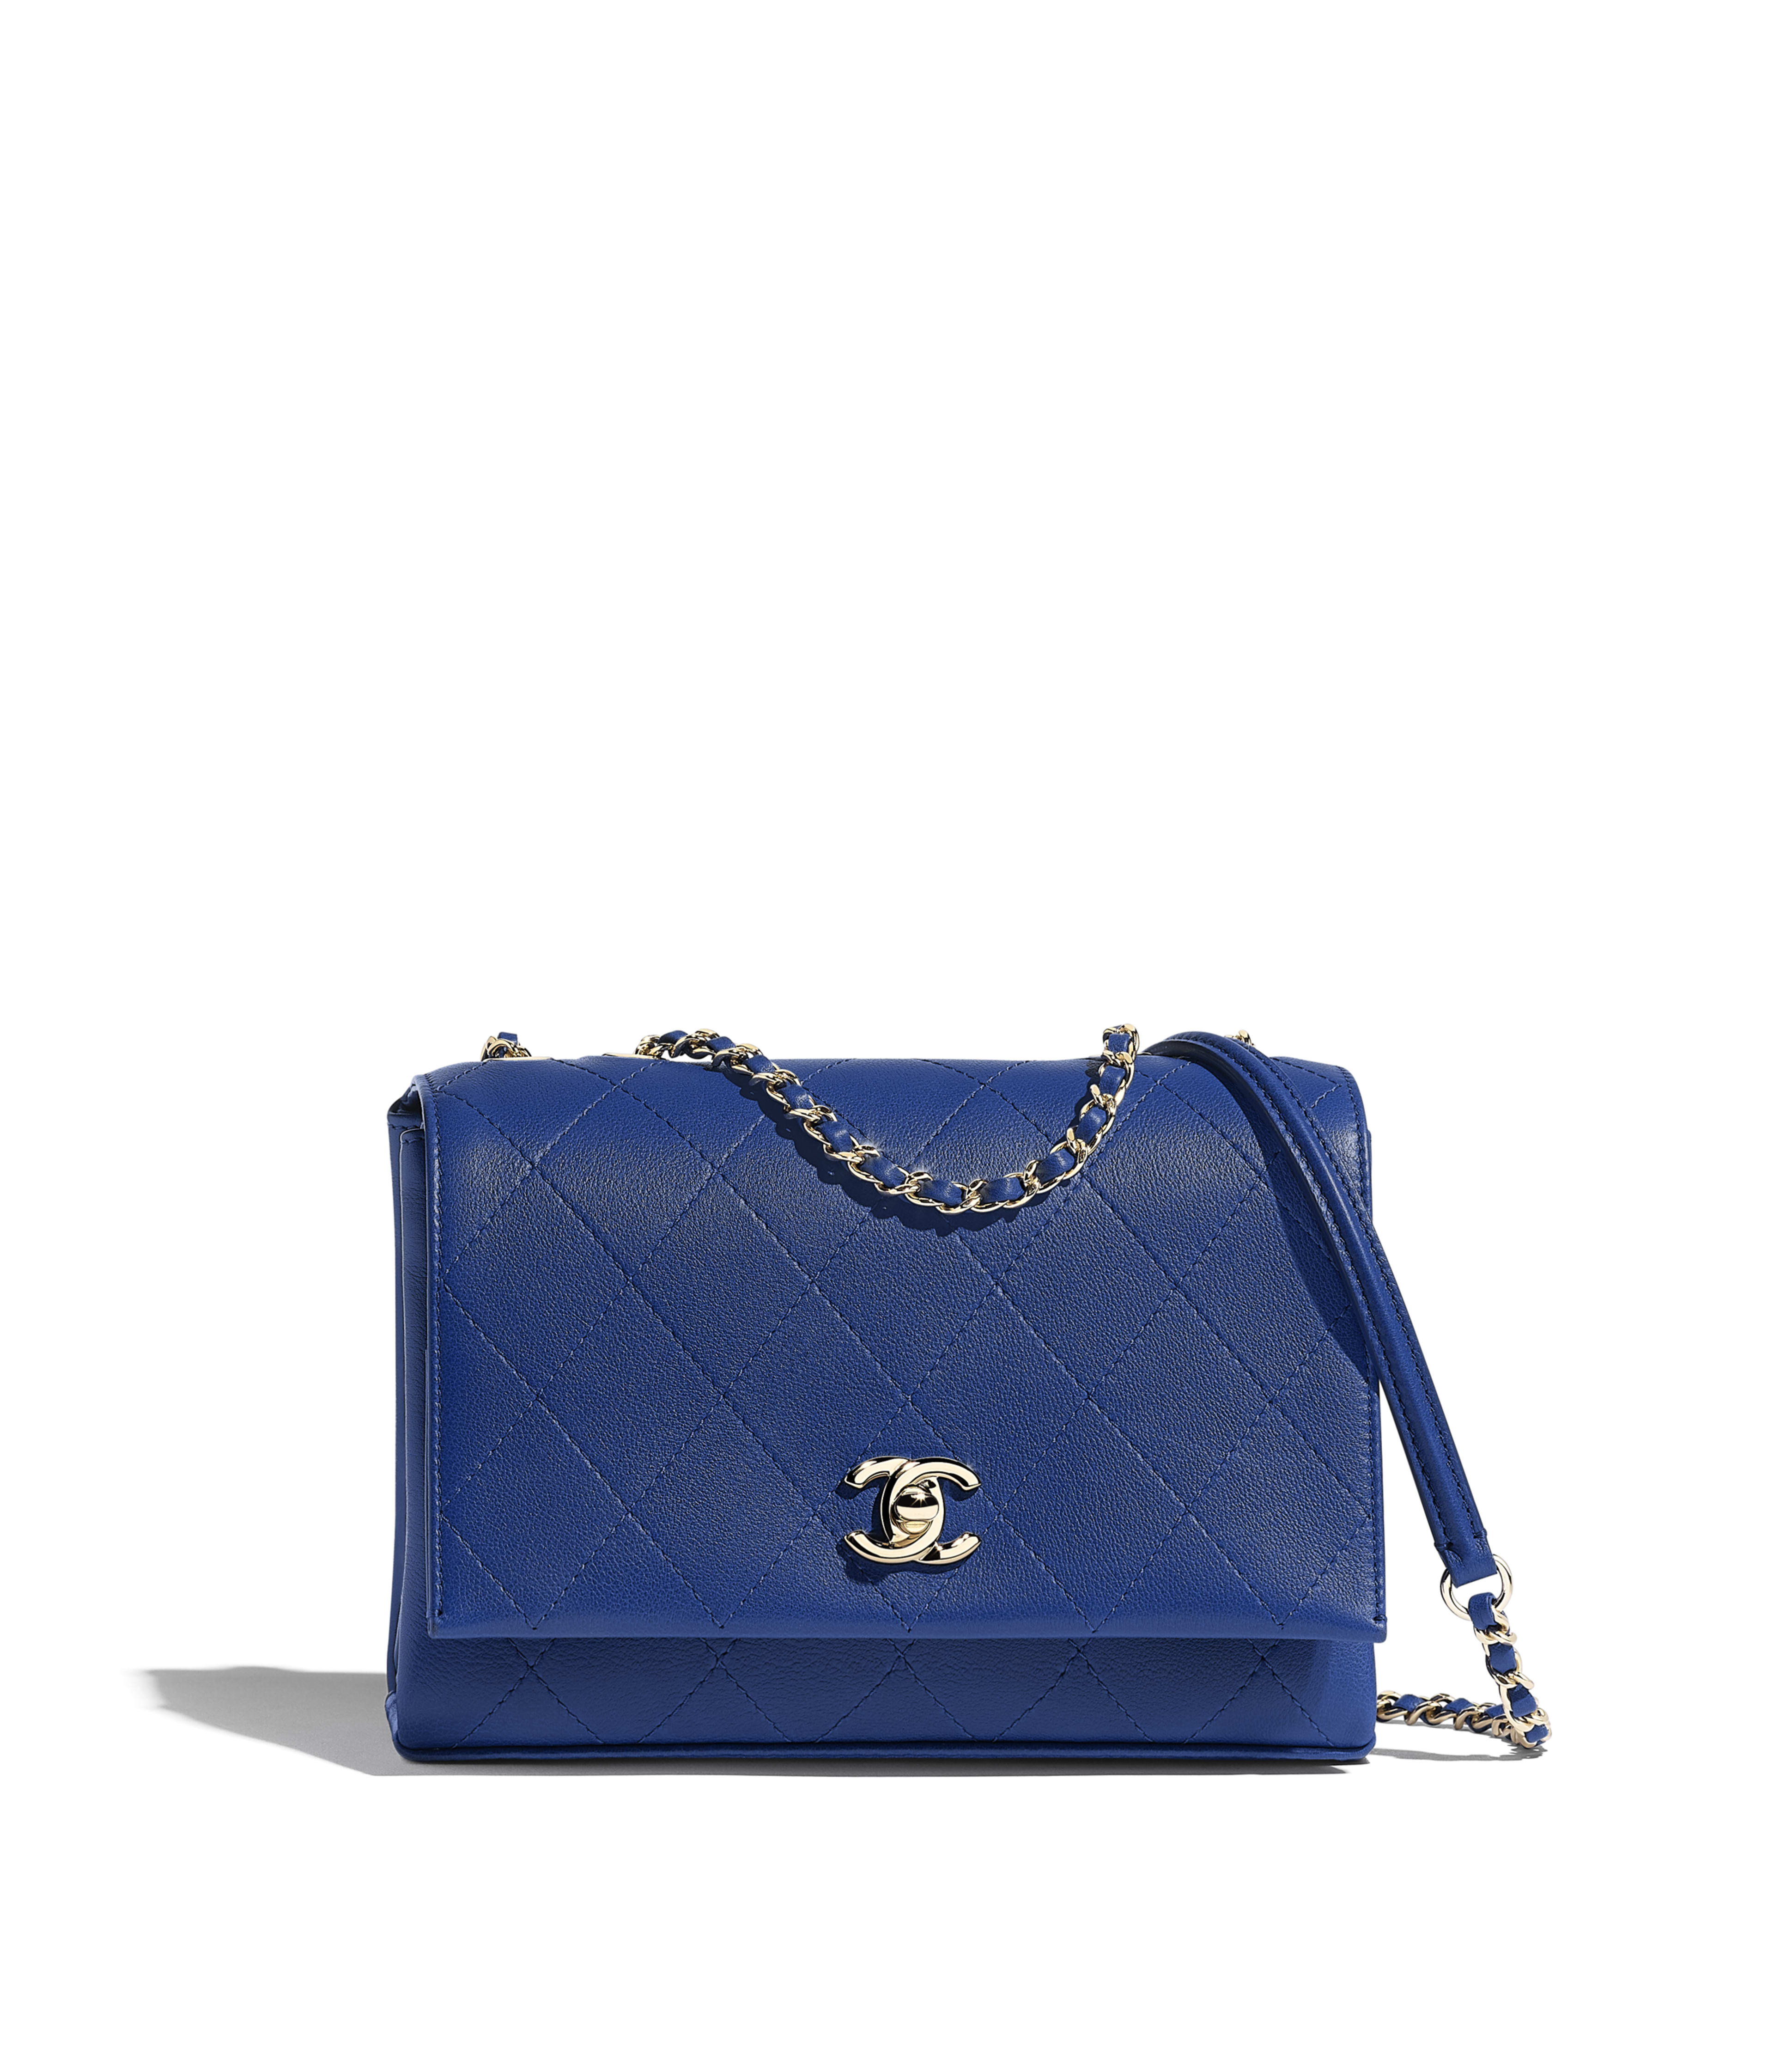 84a0b100fd39 Flap Bag Calfskin & Gold-Tone Metal, Dark Blue Ref. AS0645B004455B645